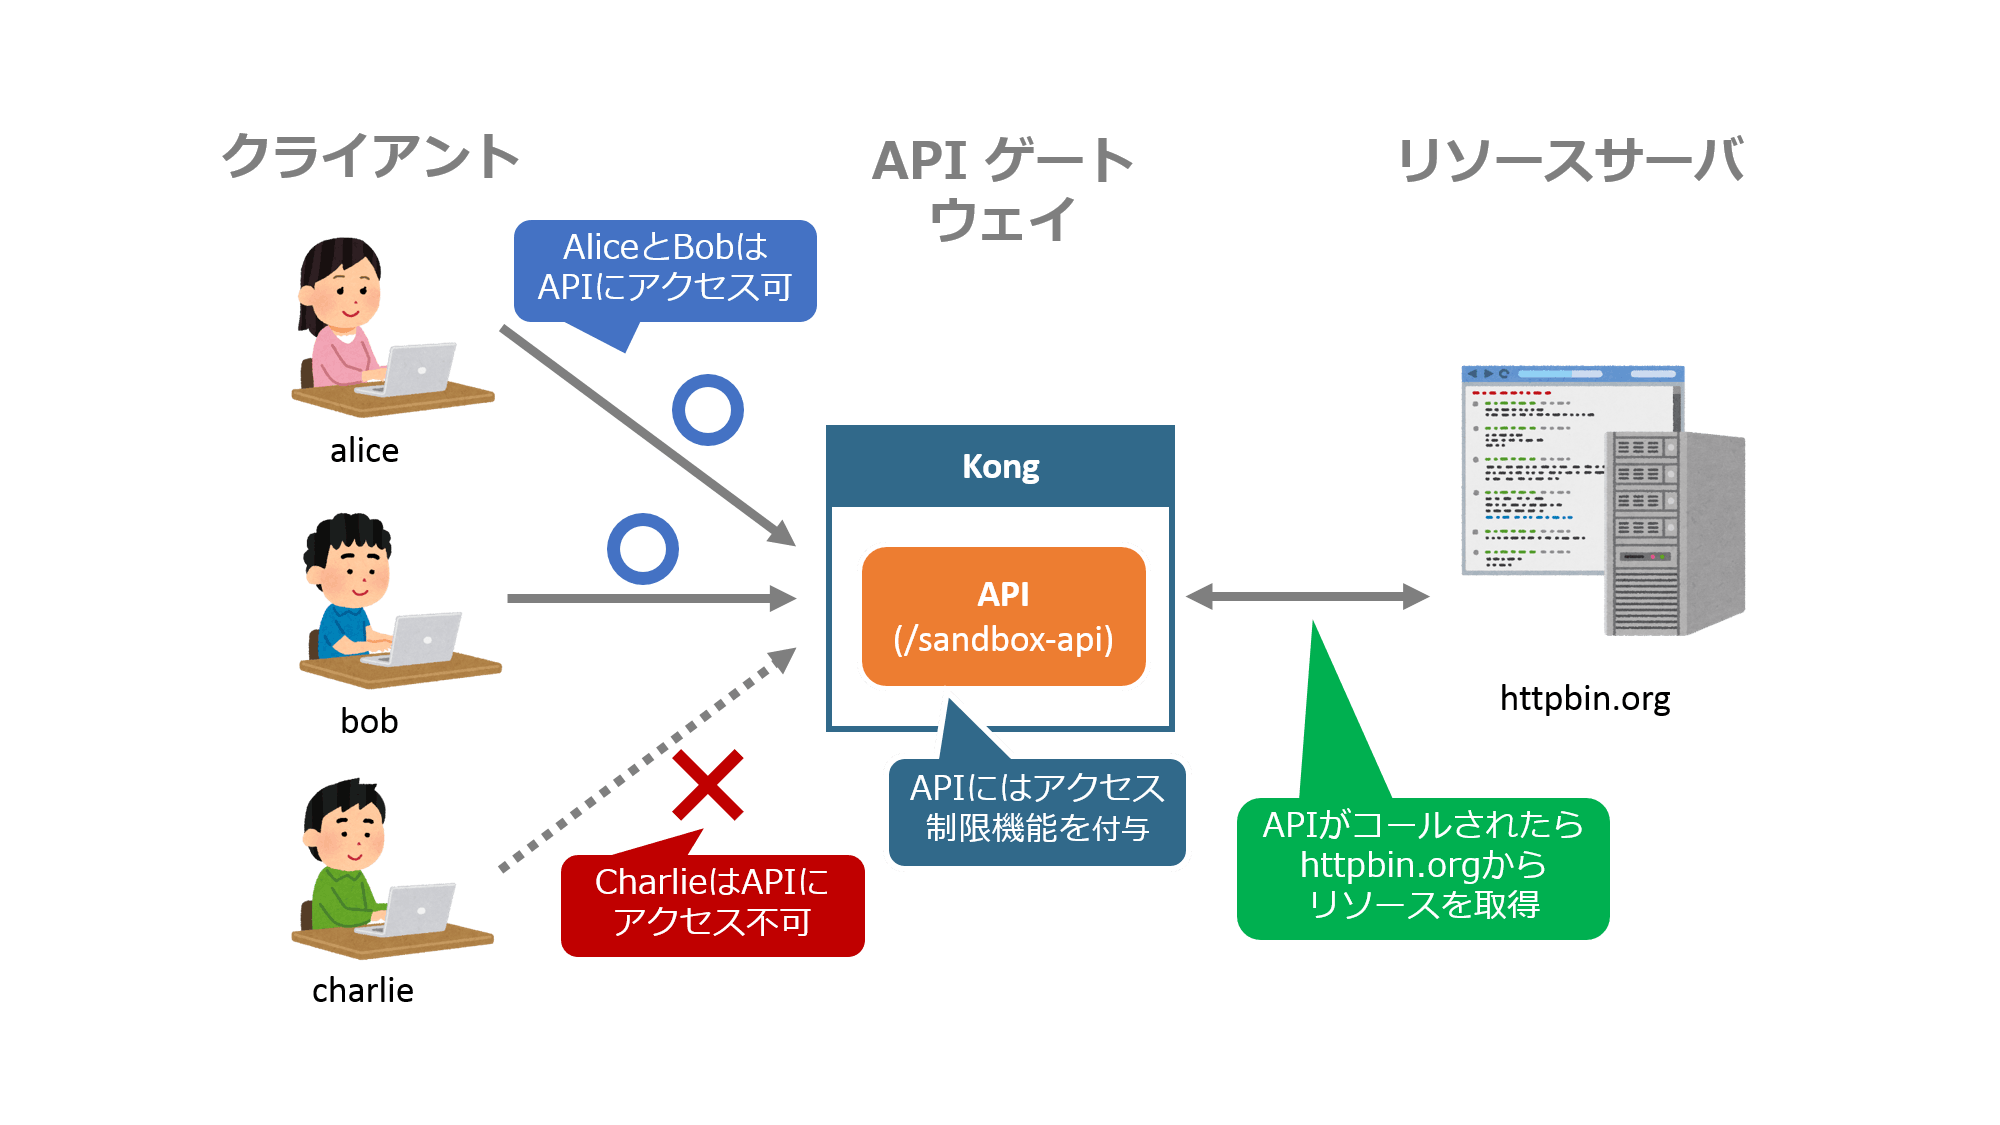 kong-keyauth-1.png